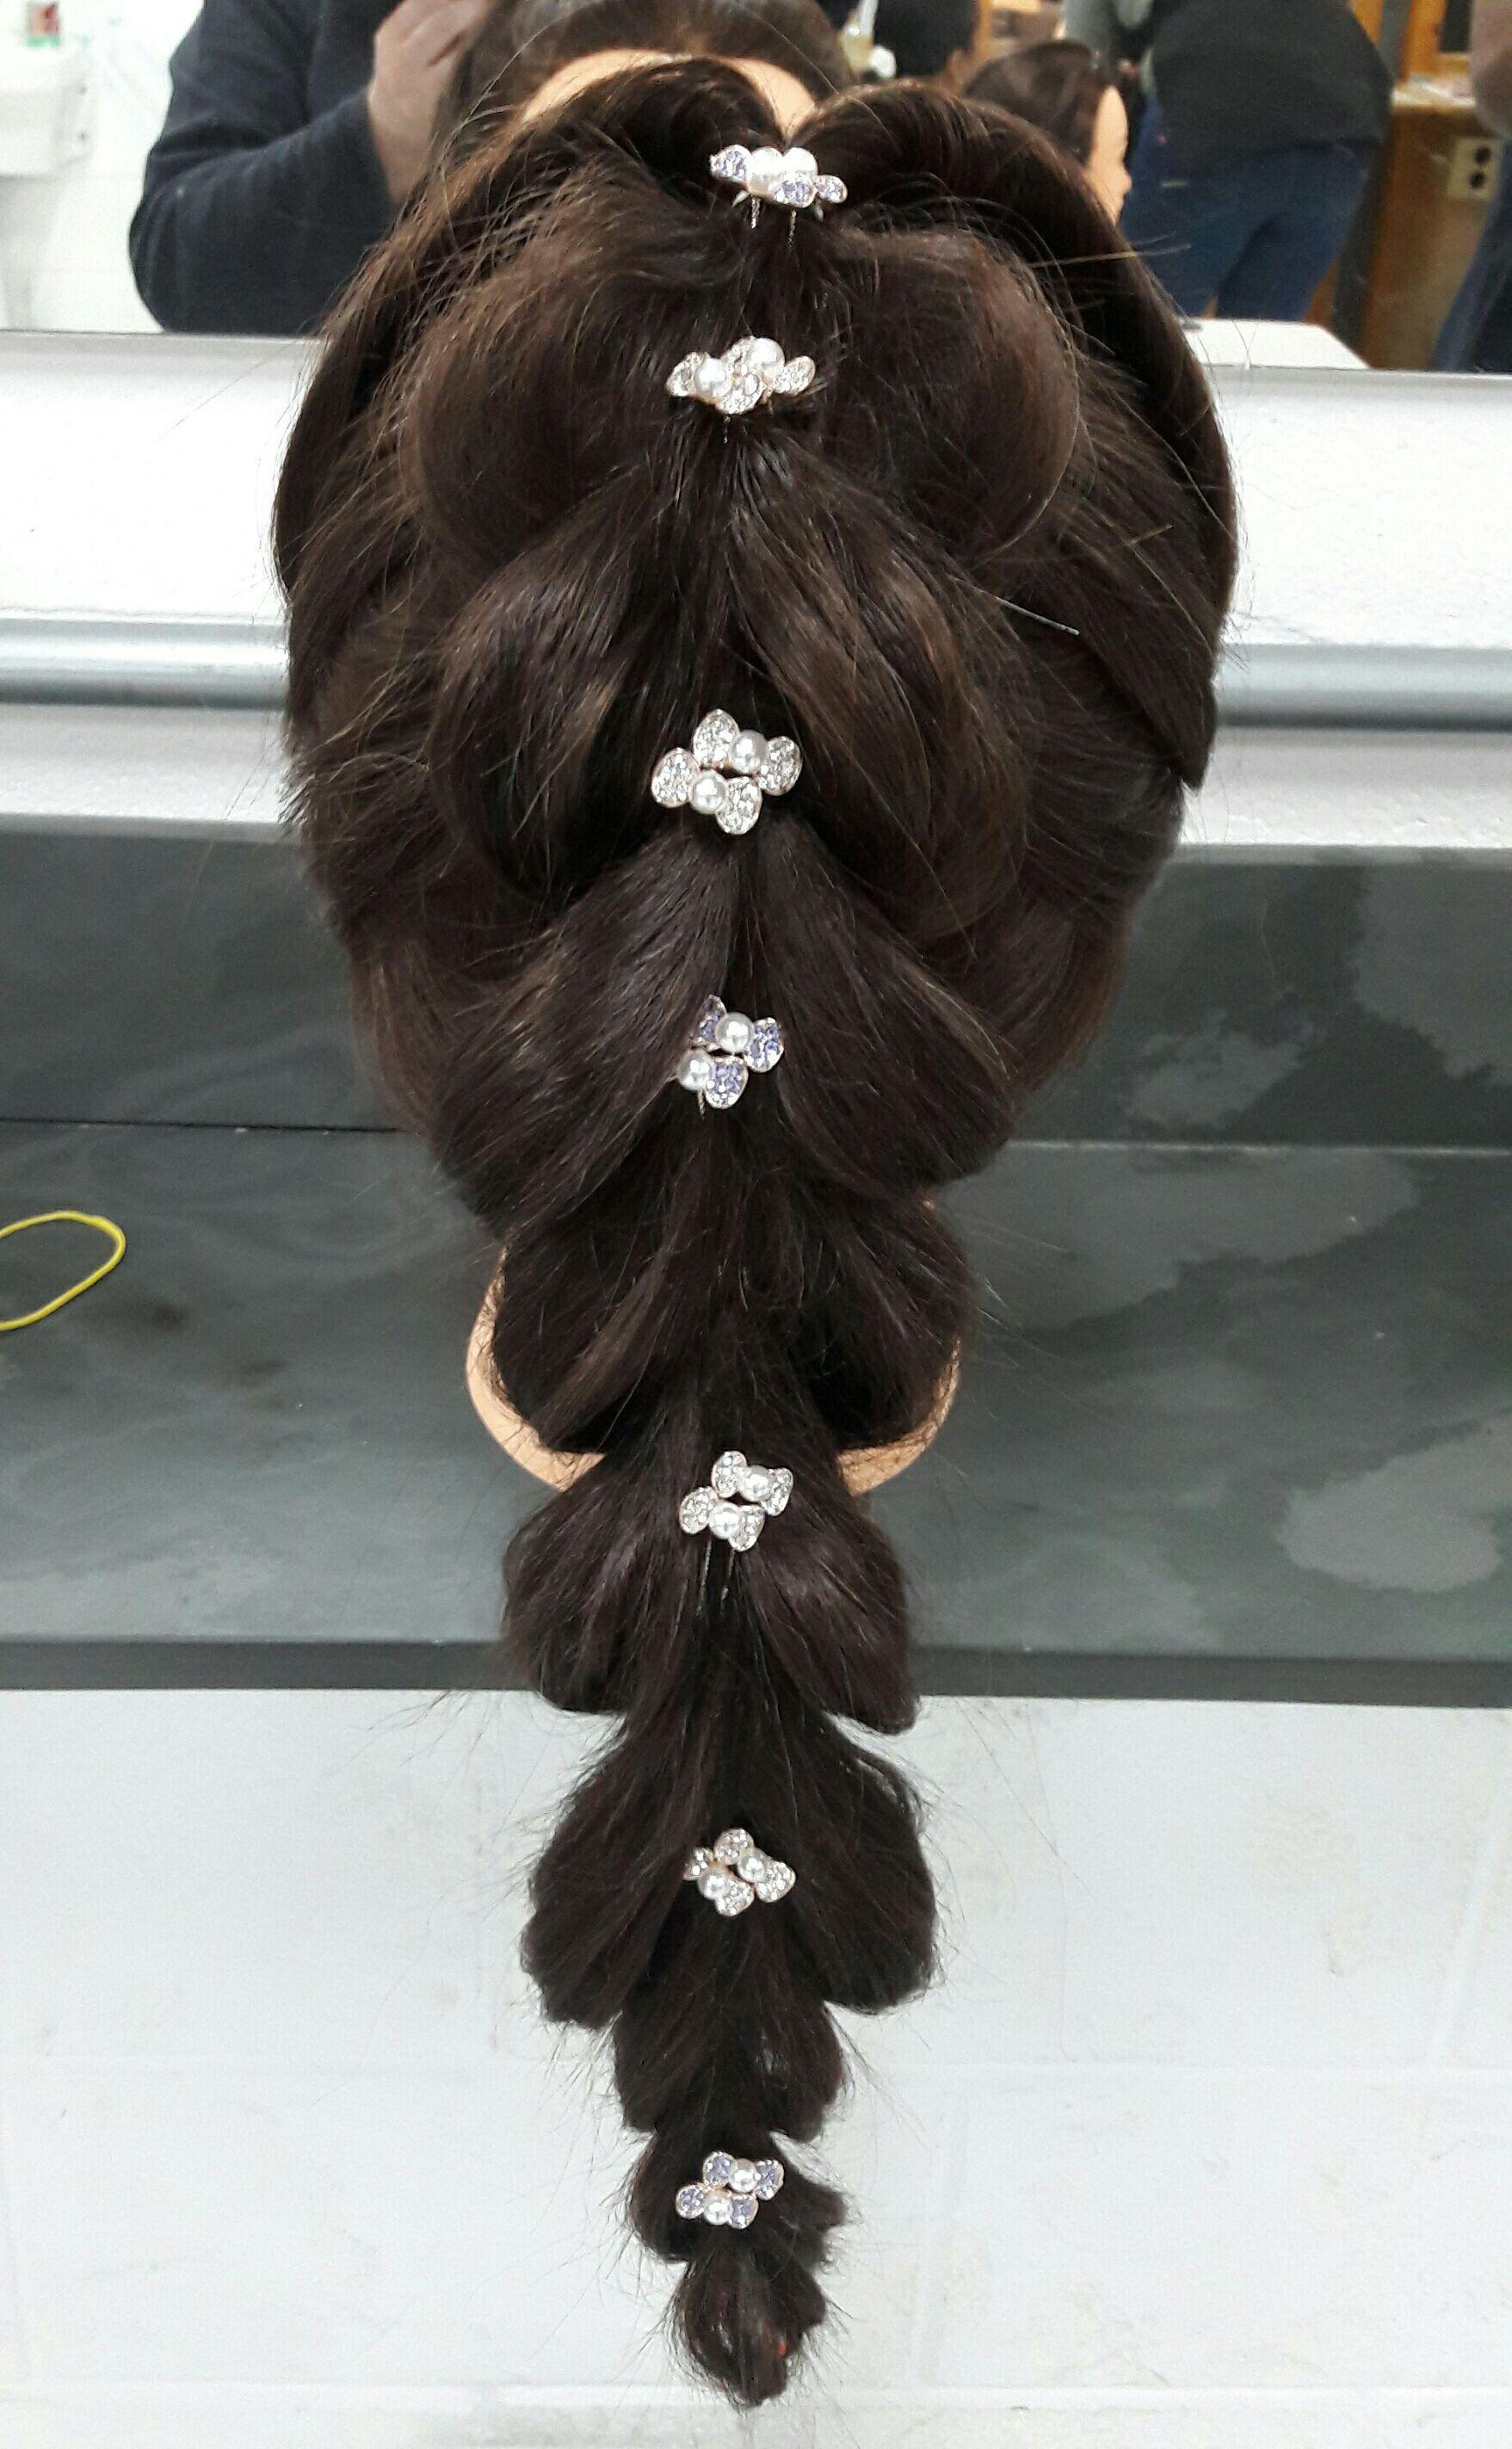 cabelo cabeleireiro(a) auxiliar cabeleireiro(a) manicure e pedicure